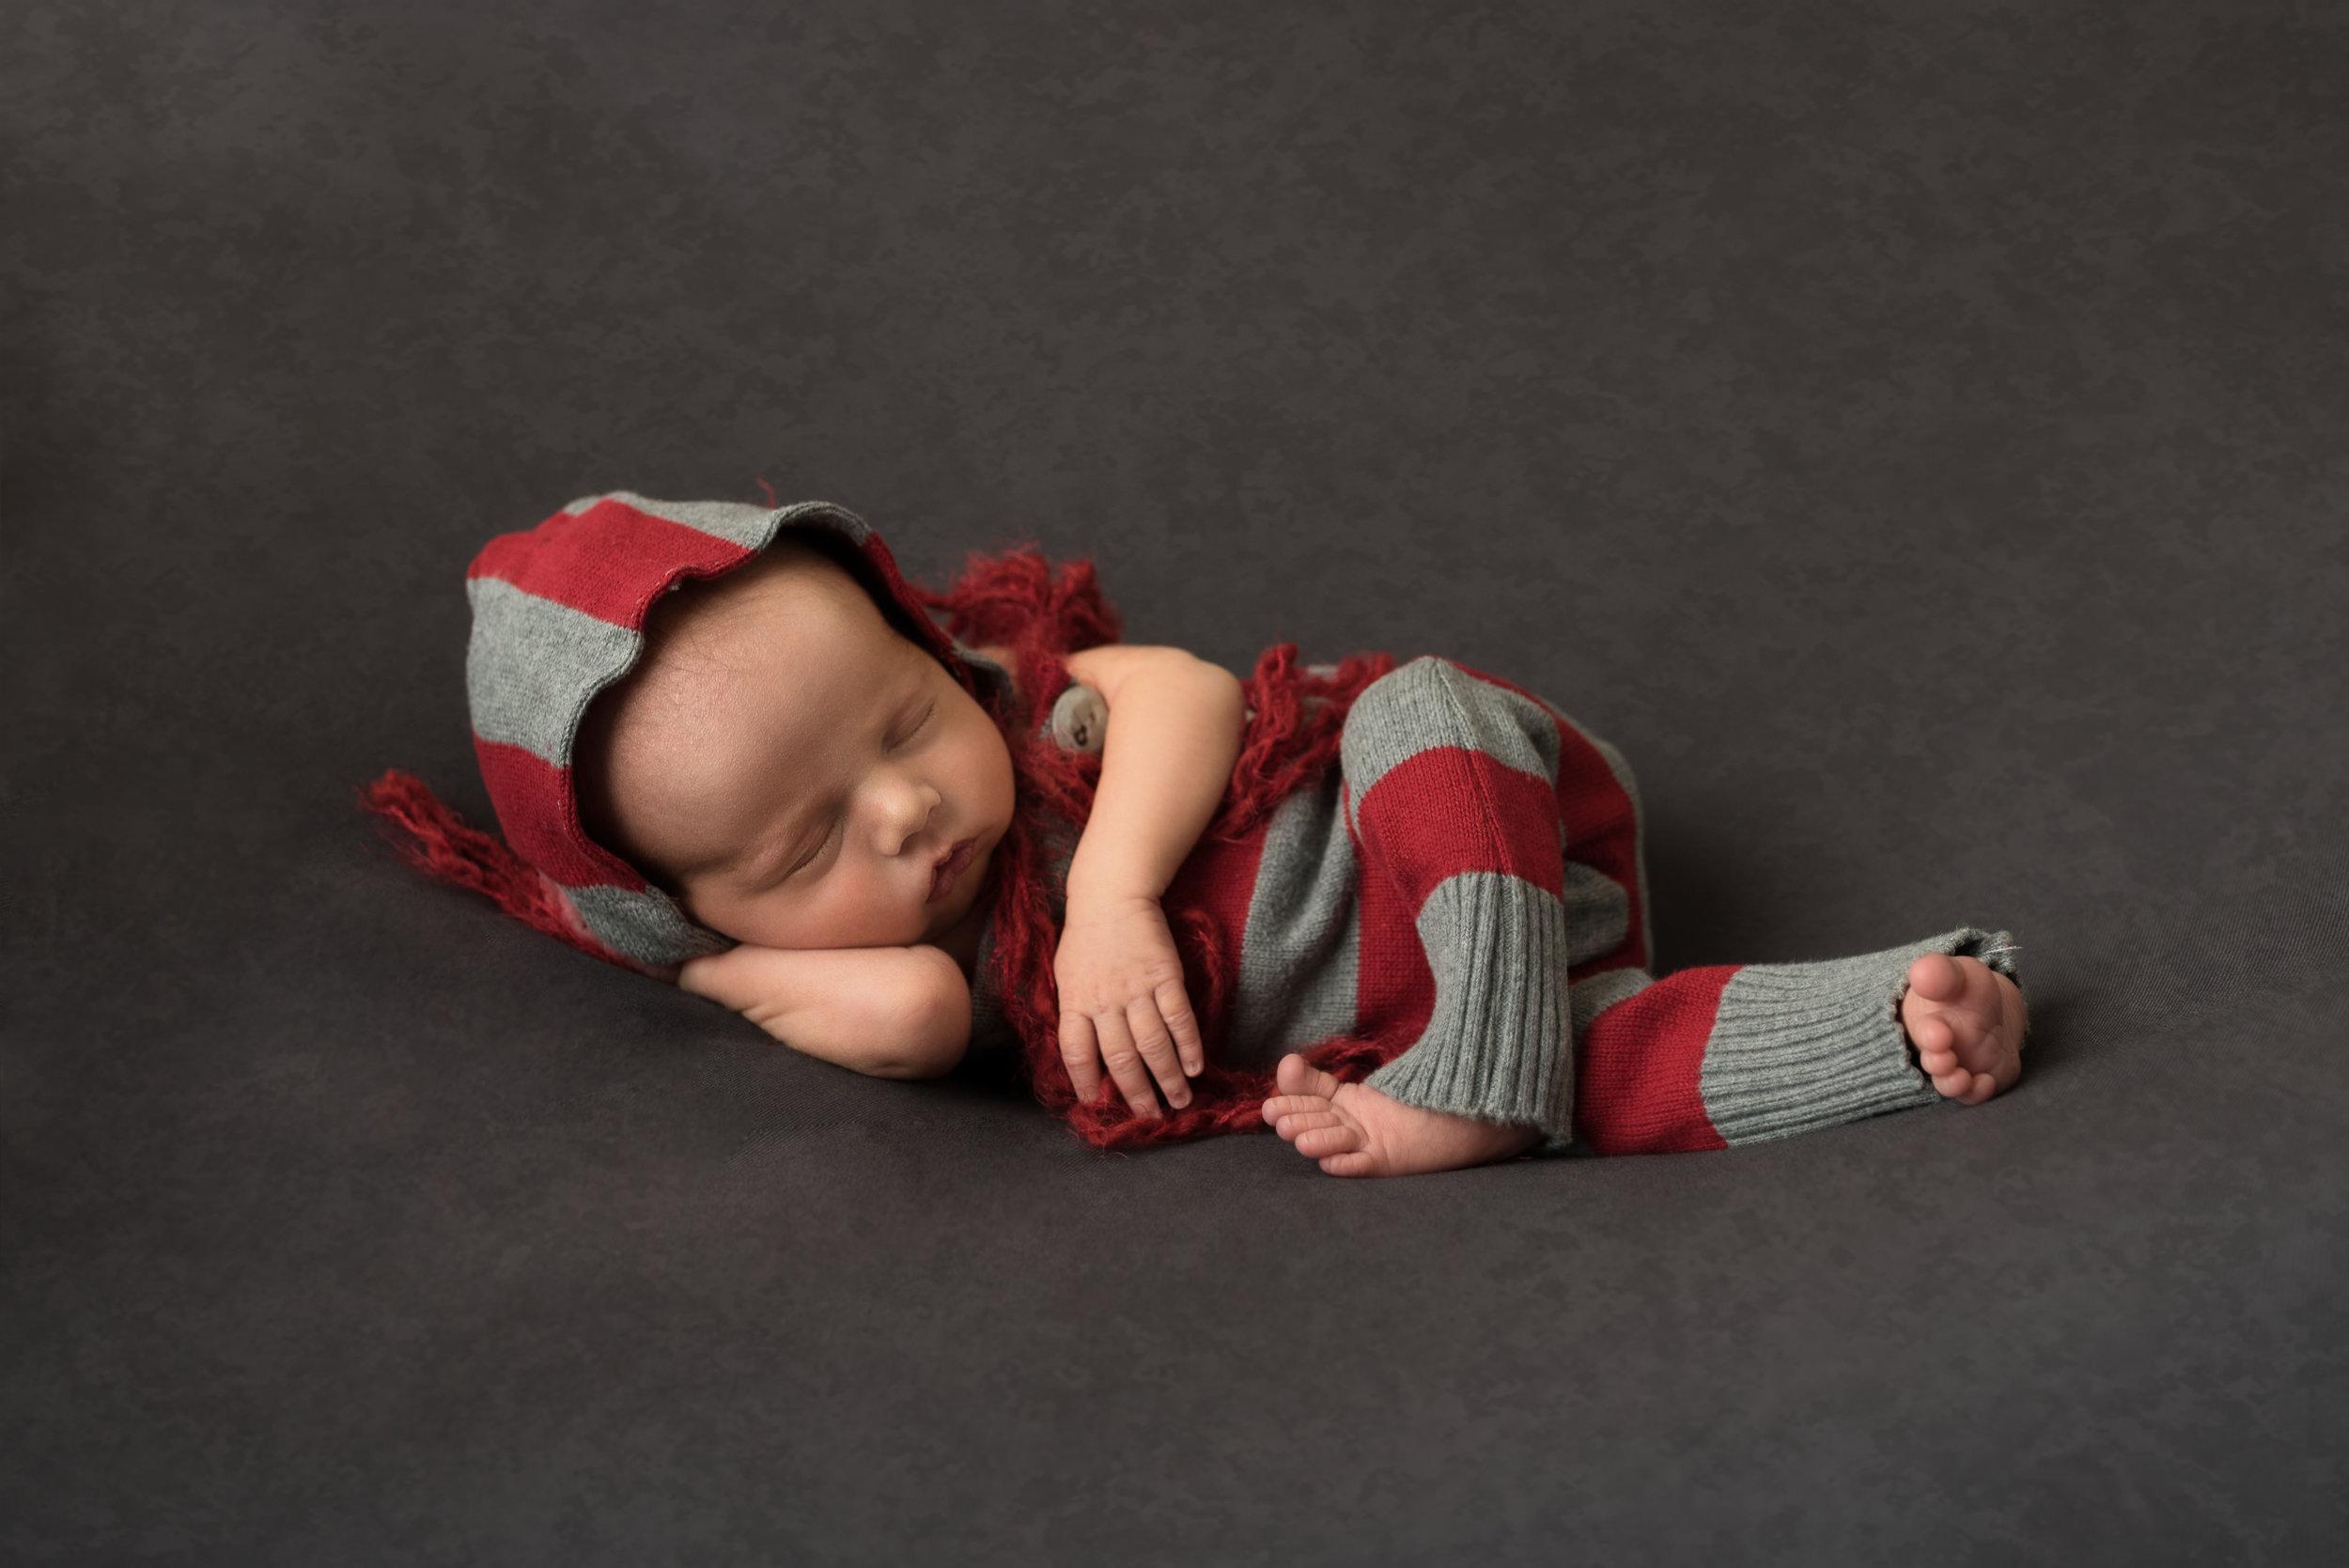 Baby boy is posing on grey